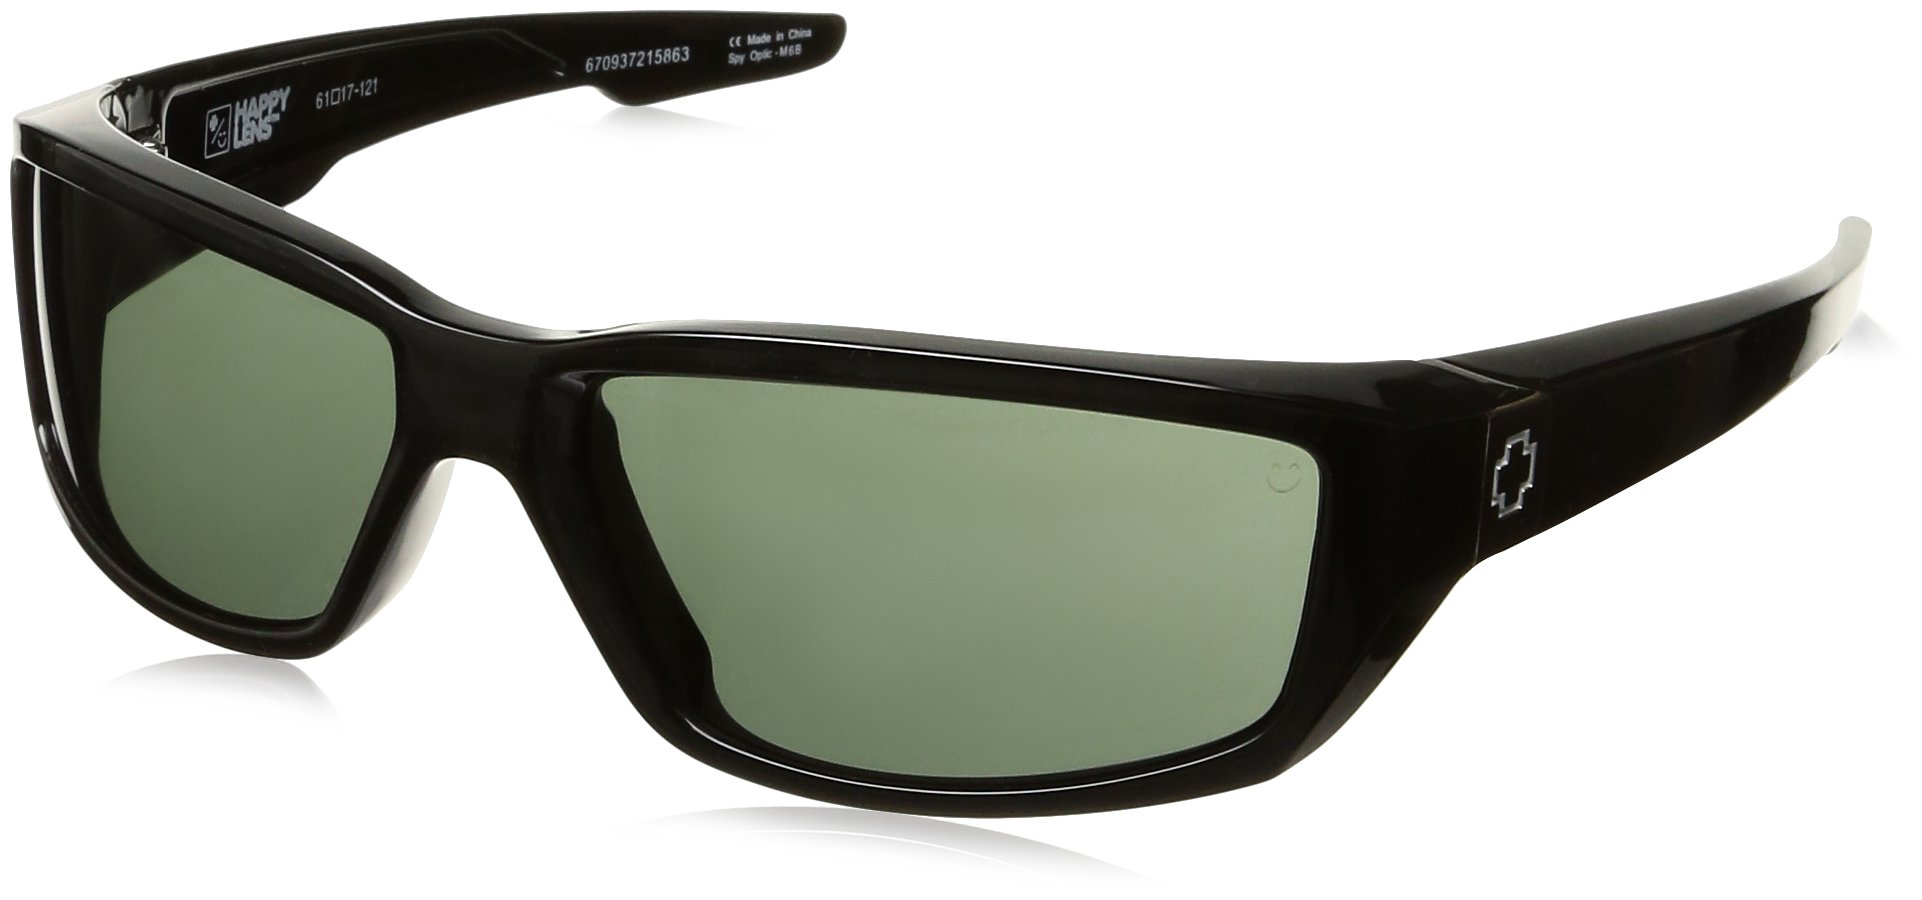 Spy Optic Dirty MO Flat Sunglasses, Black/Signature Happy Gray/Green, 59 mm